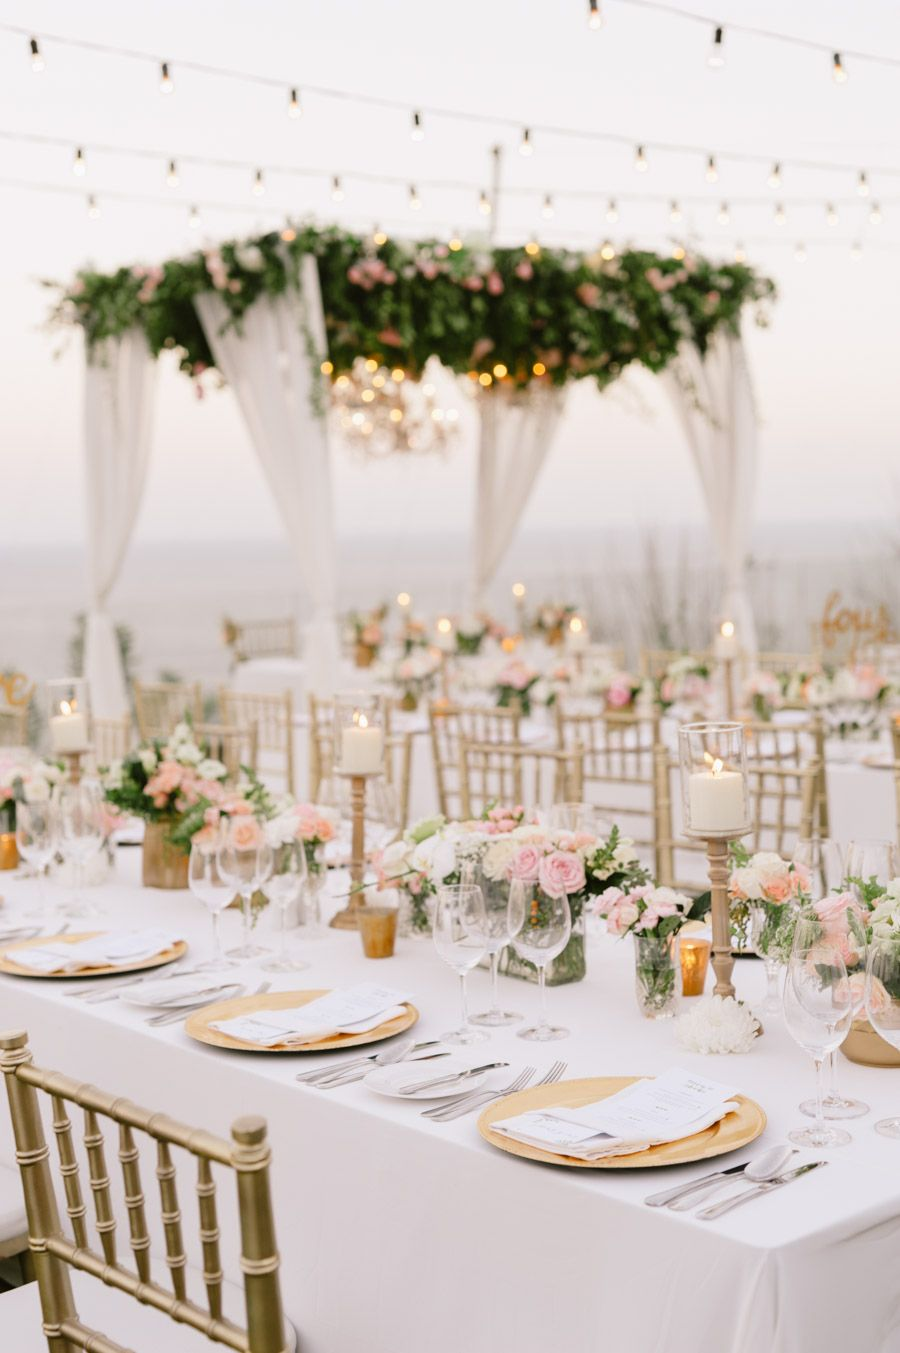 Jordan and mercys elegant bali garden wedding bali garden sunset blush and gold sunset wedding in bali jordan and mercys elegant bali garden wedding junglespirit Gallery